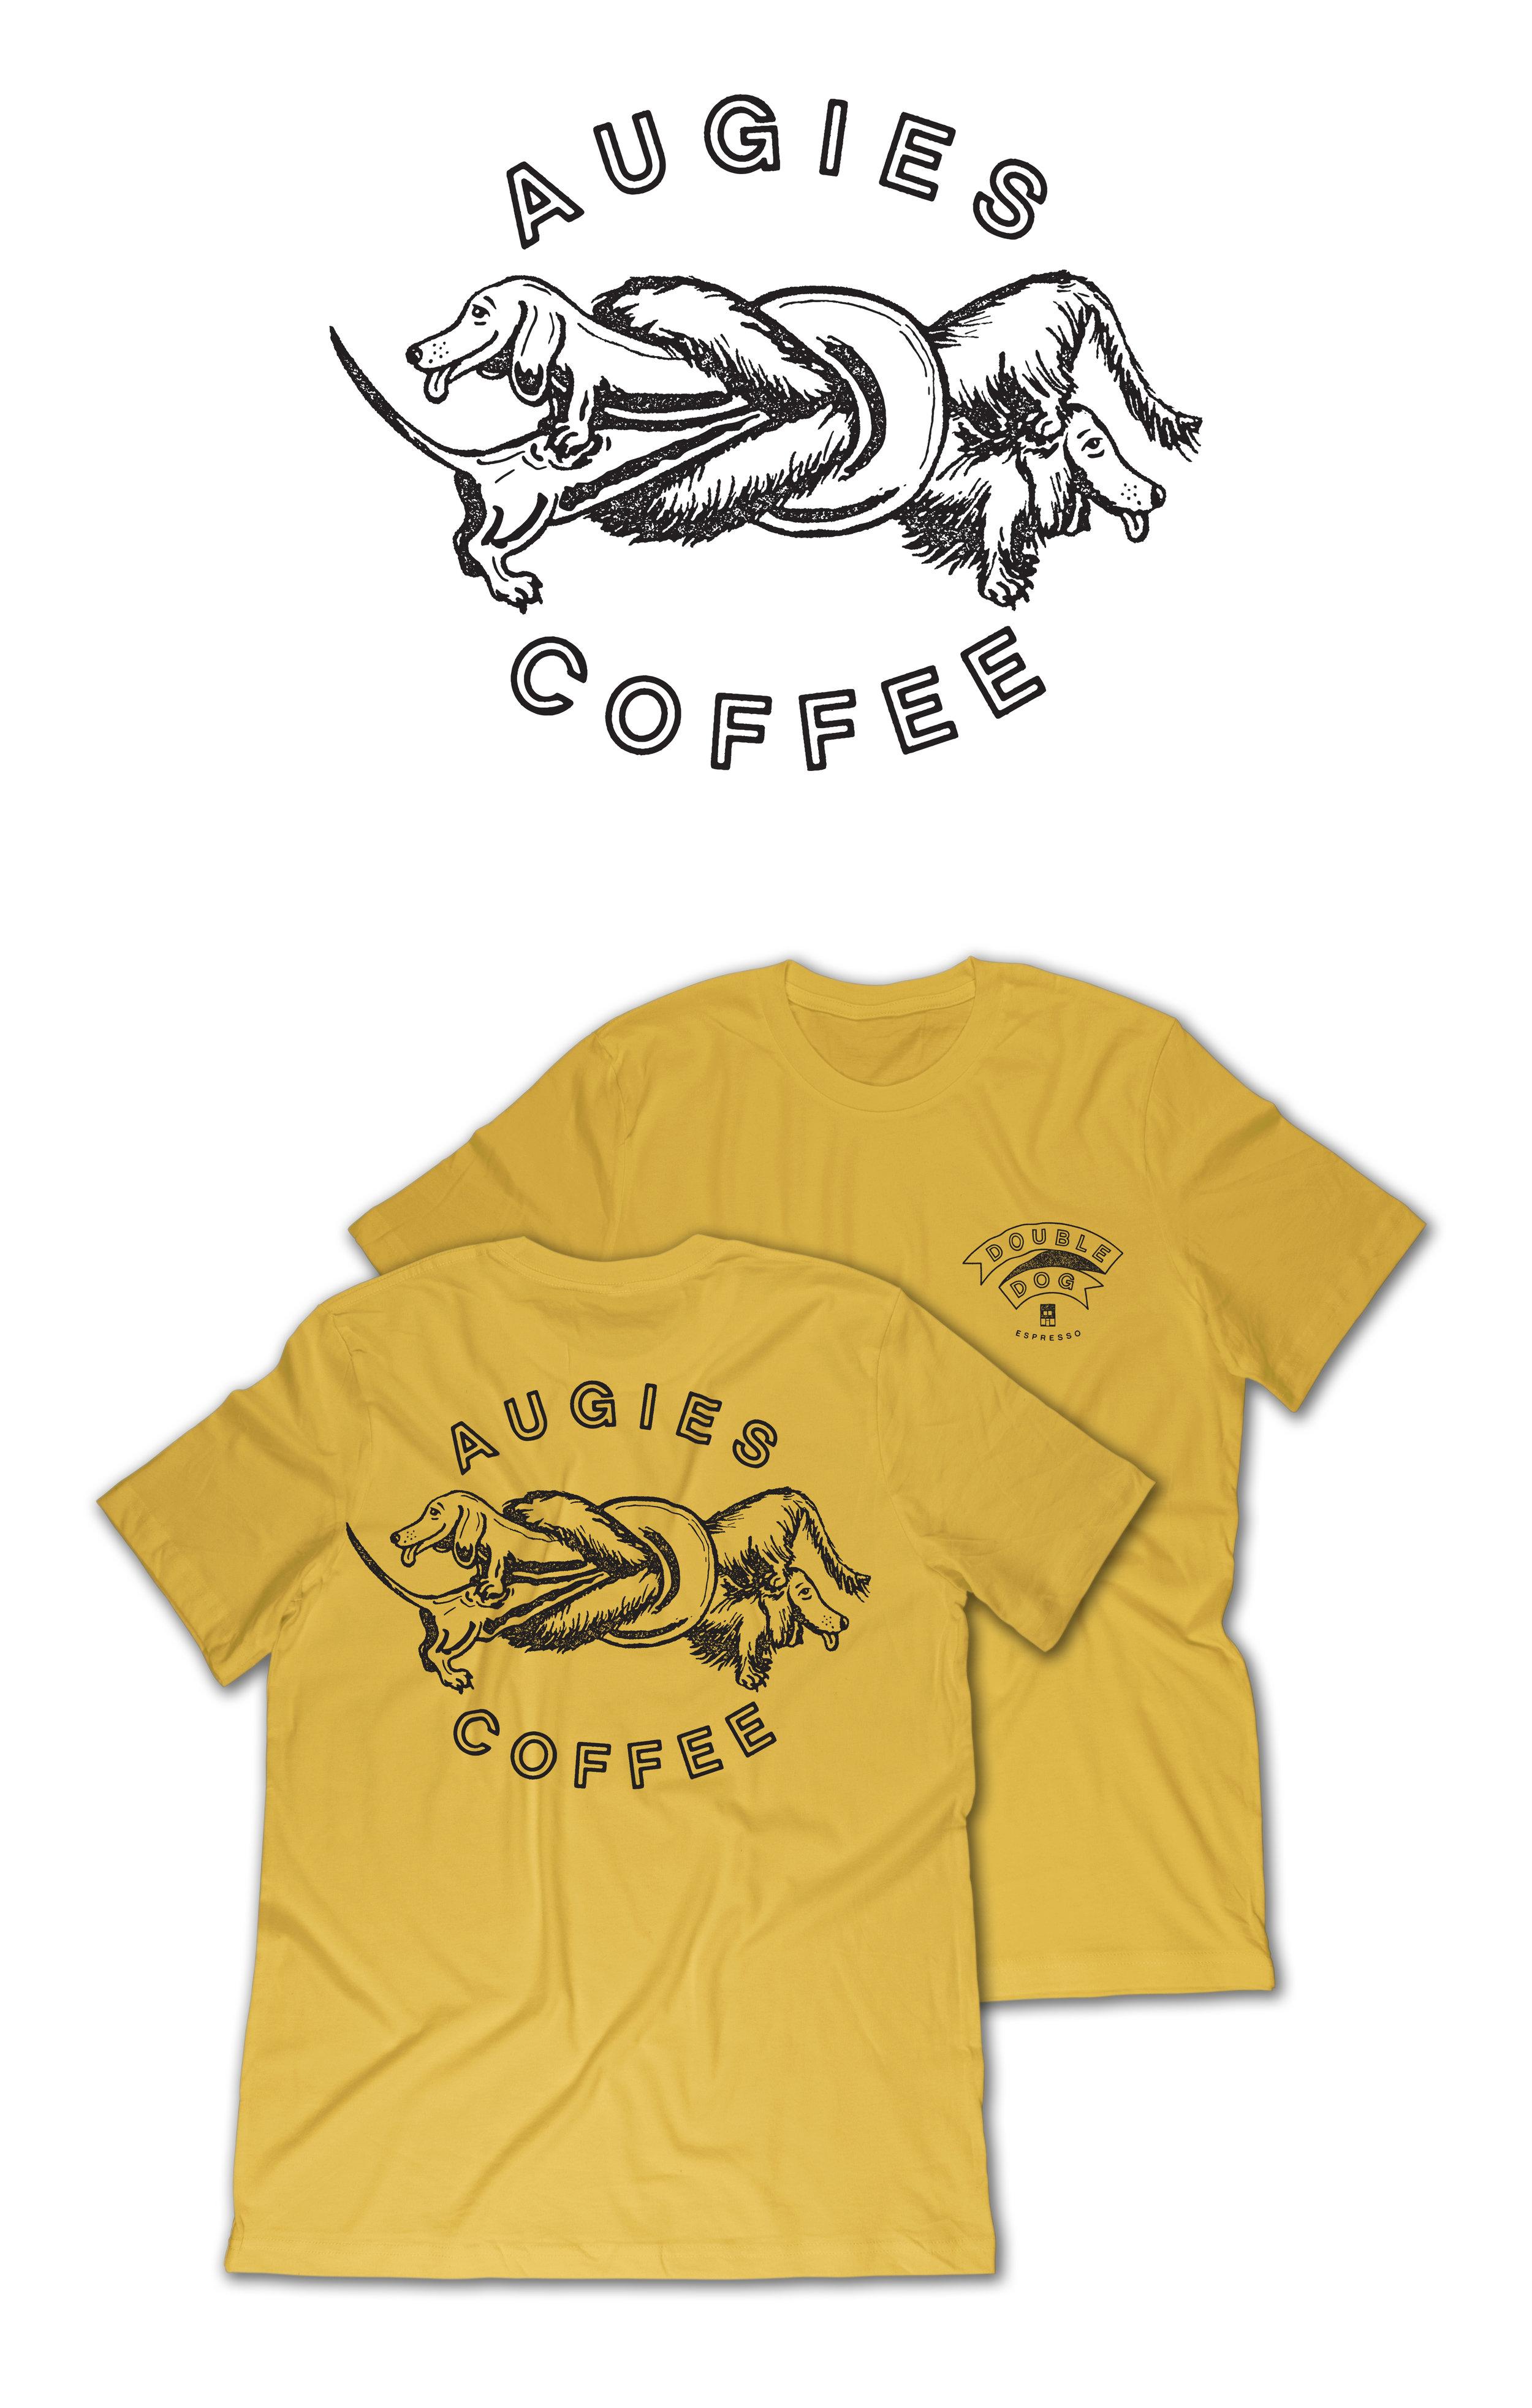 Augies-DoubleDogShirt&Logo2-051419.jpg